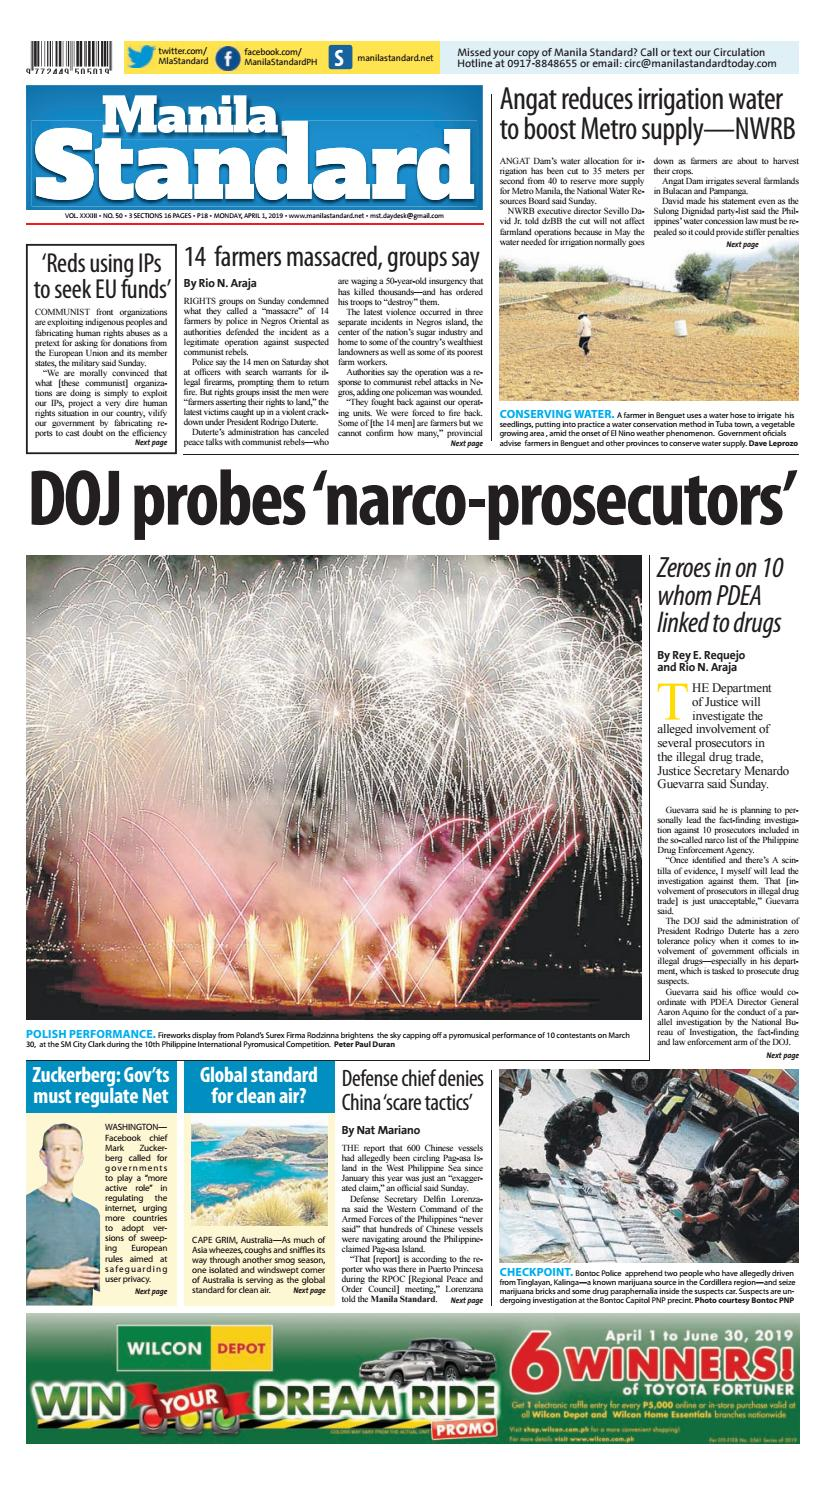 Manila Standard pdf April 1, 2019 issue by Manila Standard